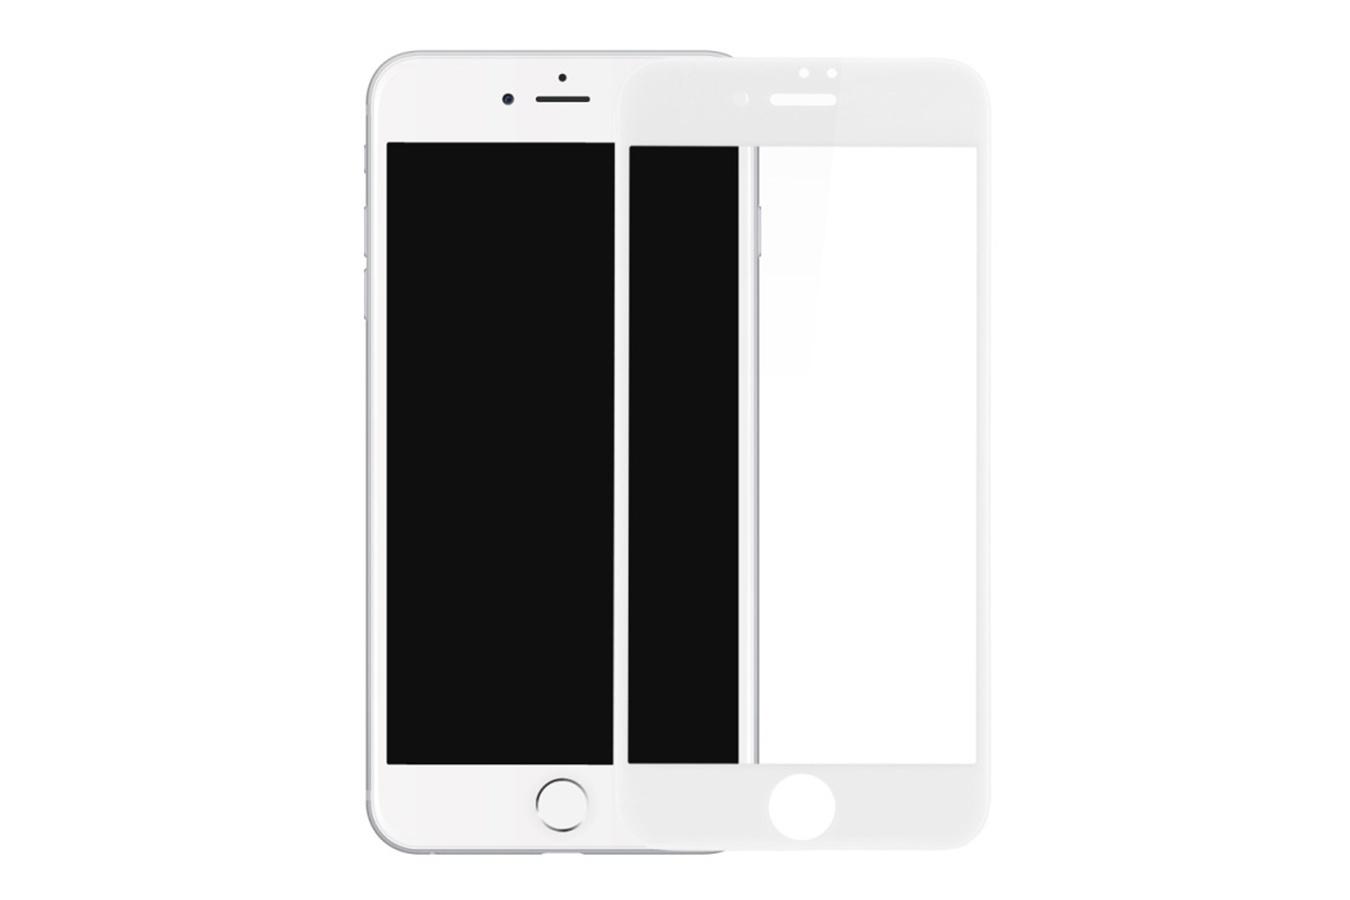 Защитное стекло Premium 6D для iPhone 7 plus White защитное матовое стекло для iphone 7 plus anti glare full screen glass white